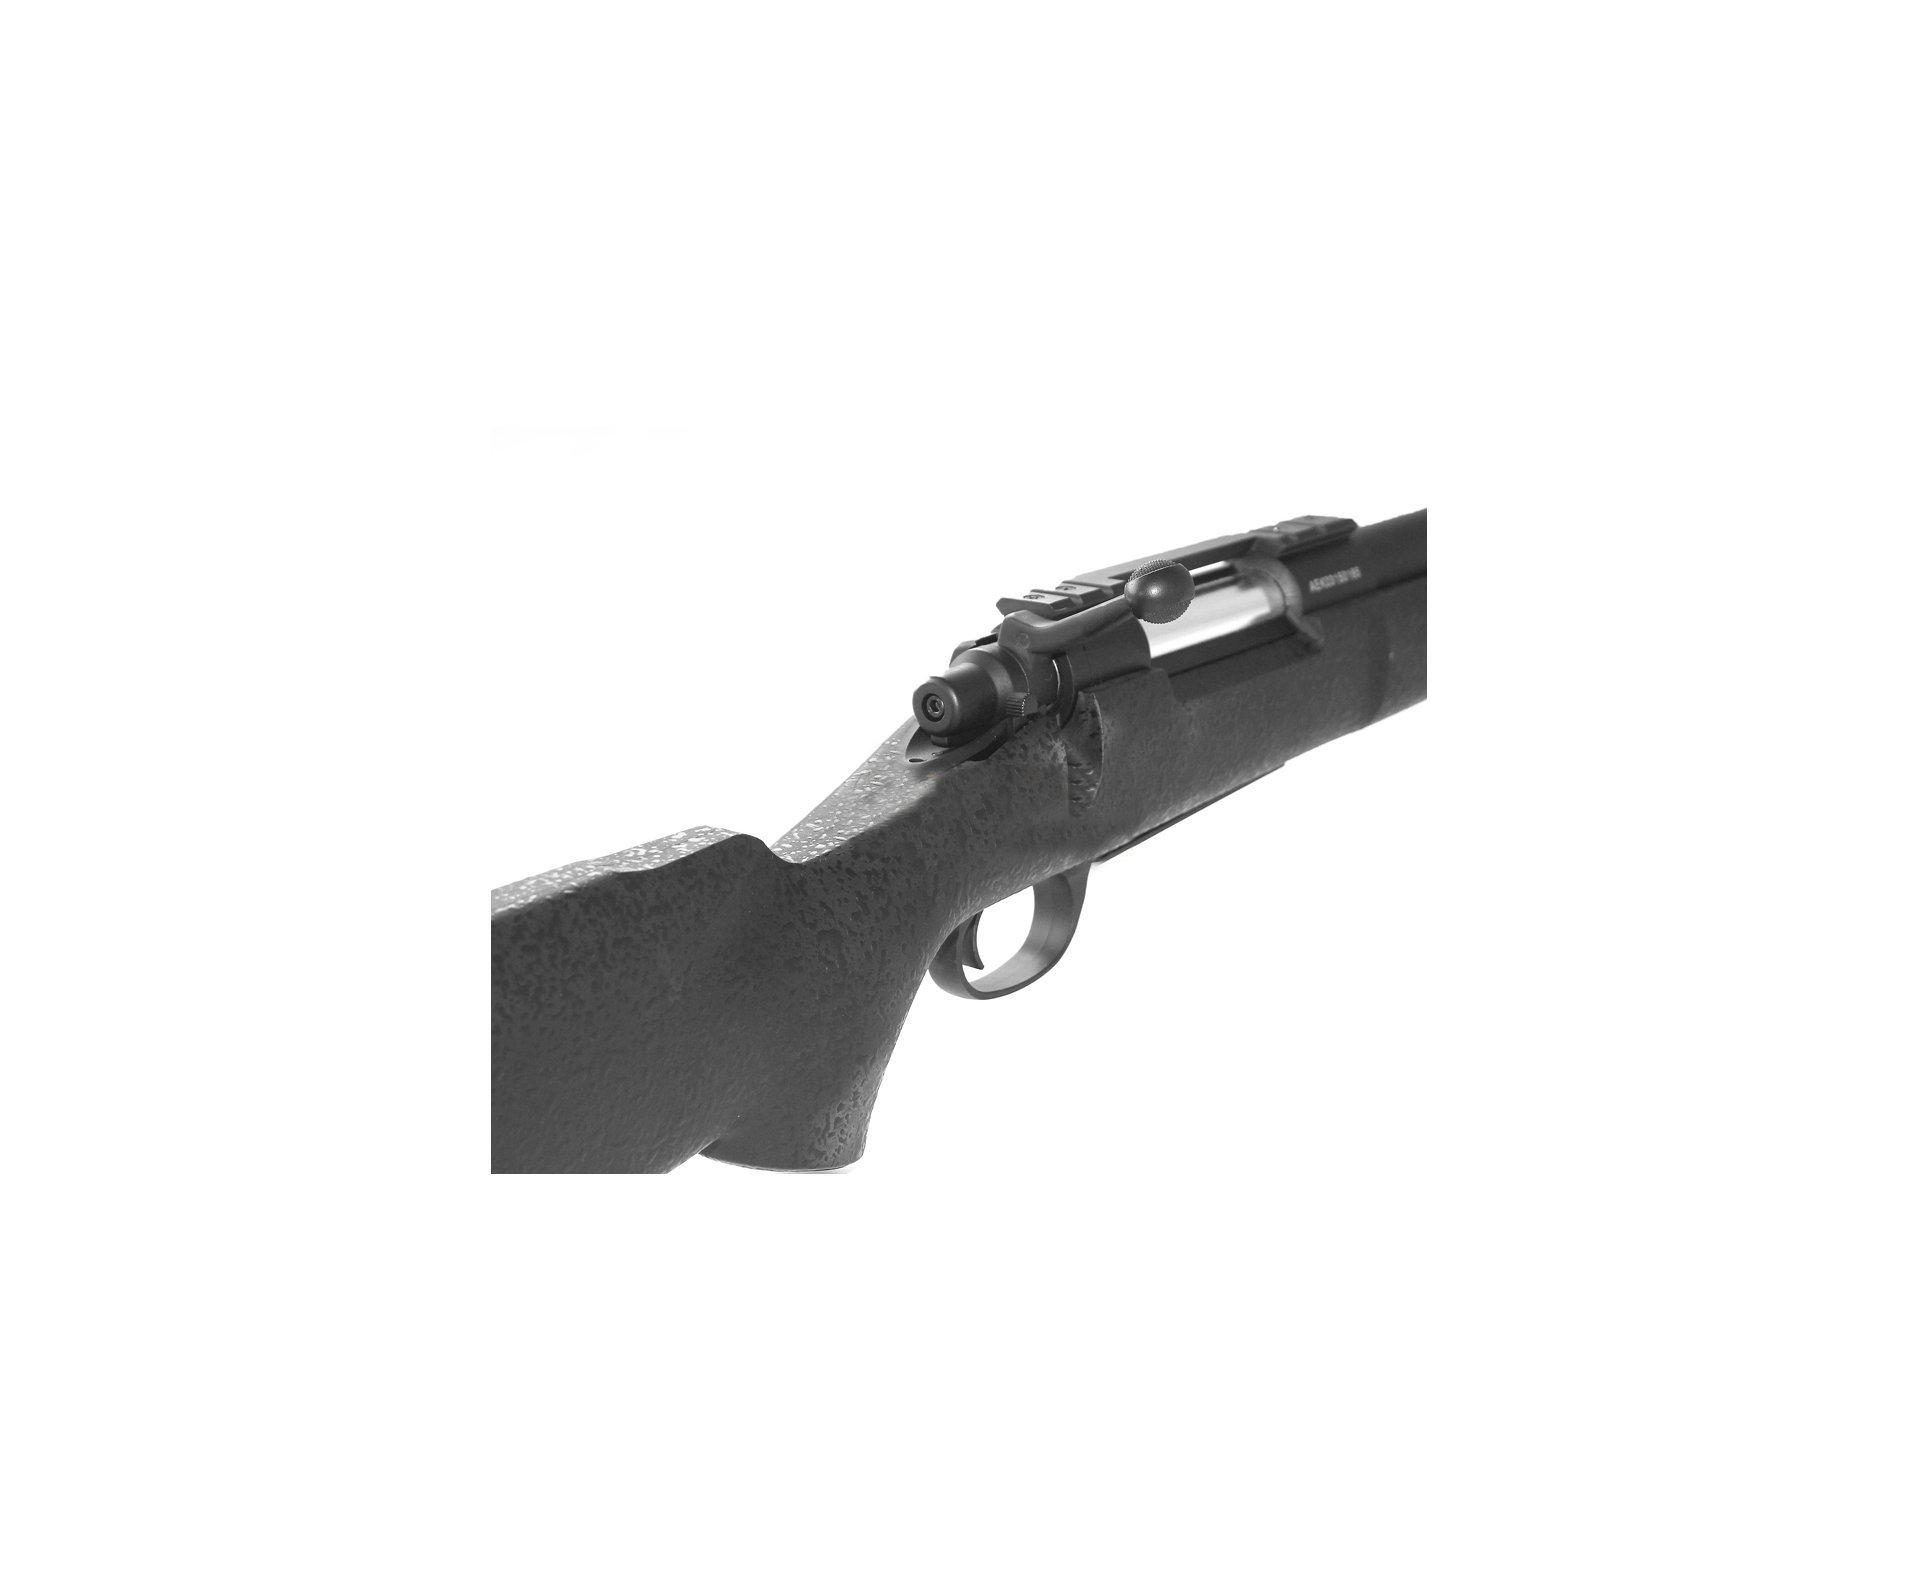 Rifle De Airsoft Sniper M24 Spring S.w.s Full Metal - Cal 6mm - Cyma